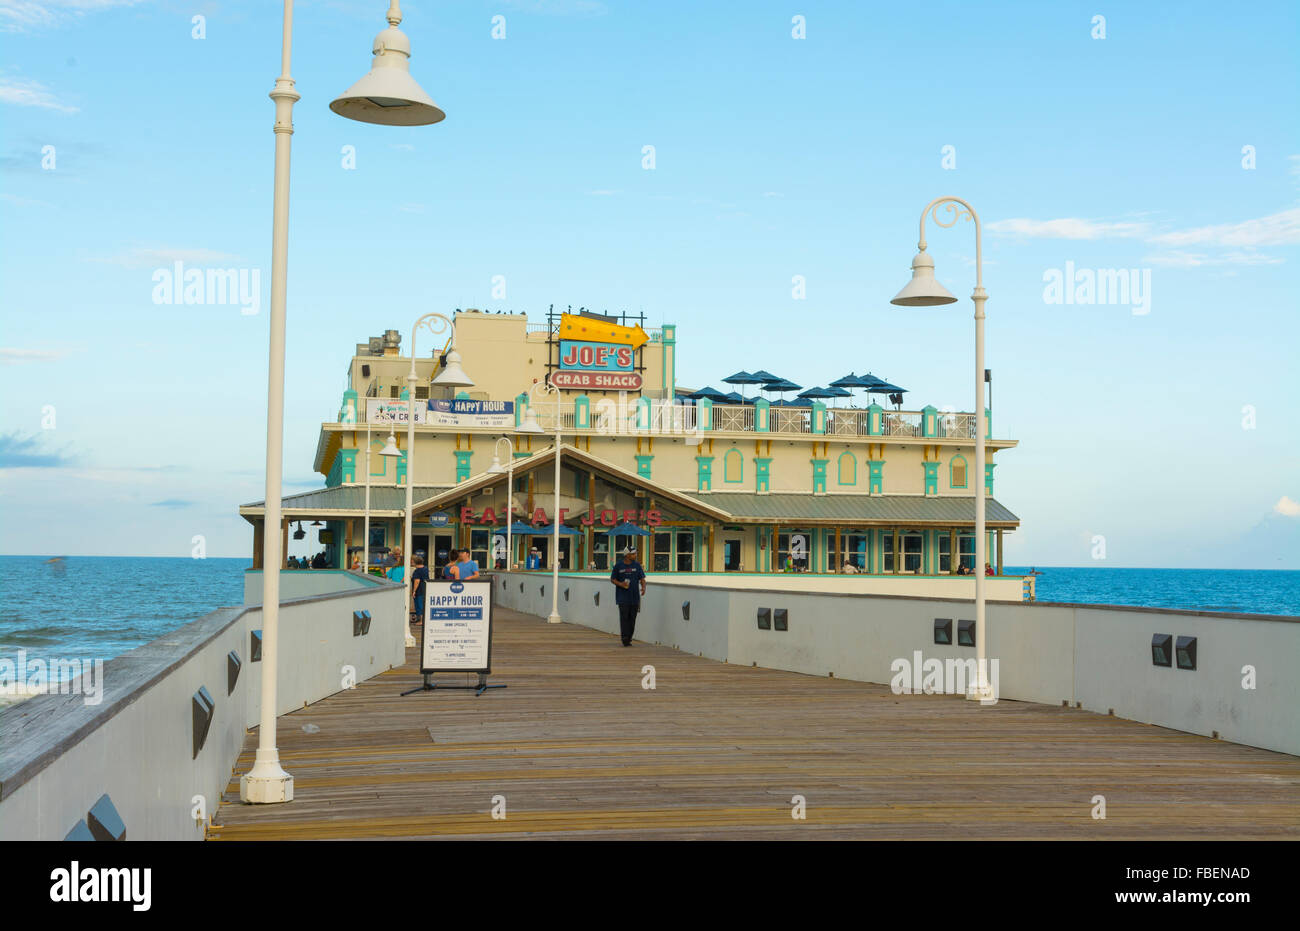 Daytona beach florida famous main street pier and for Daytona beach fishing pier